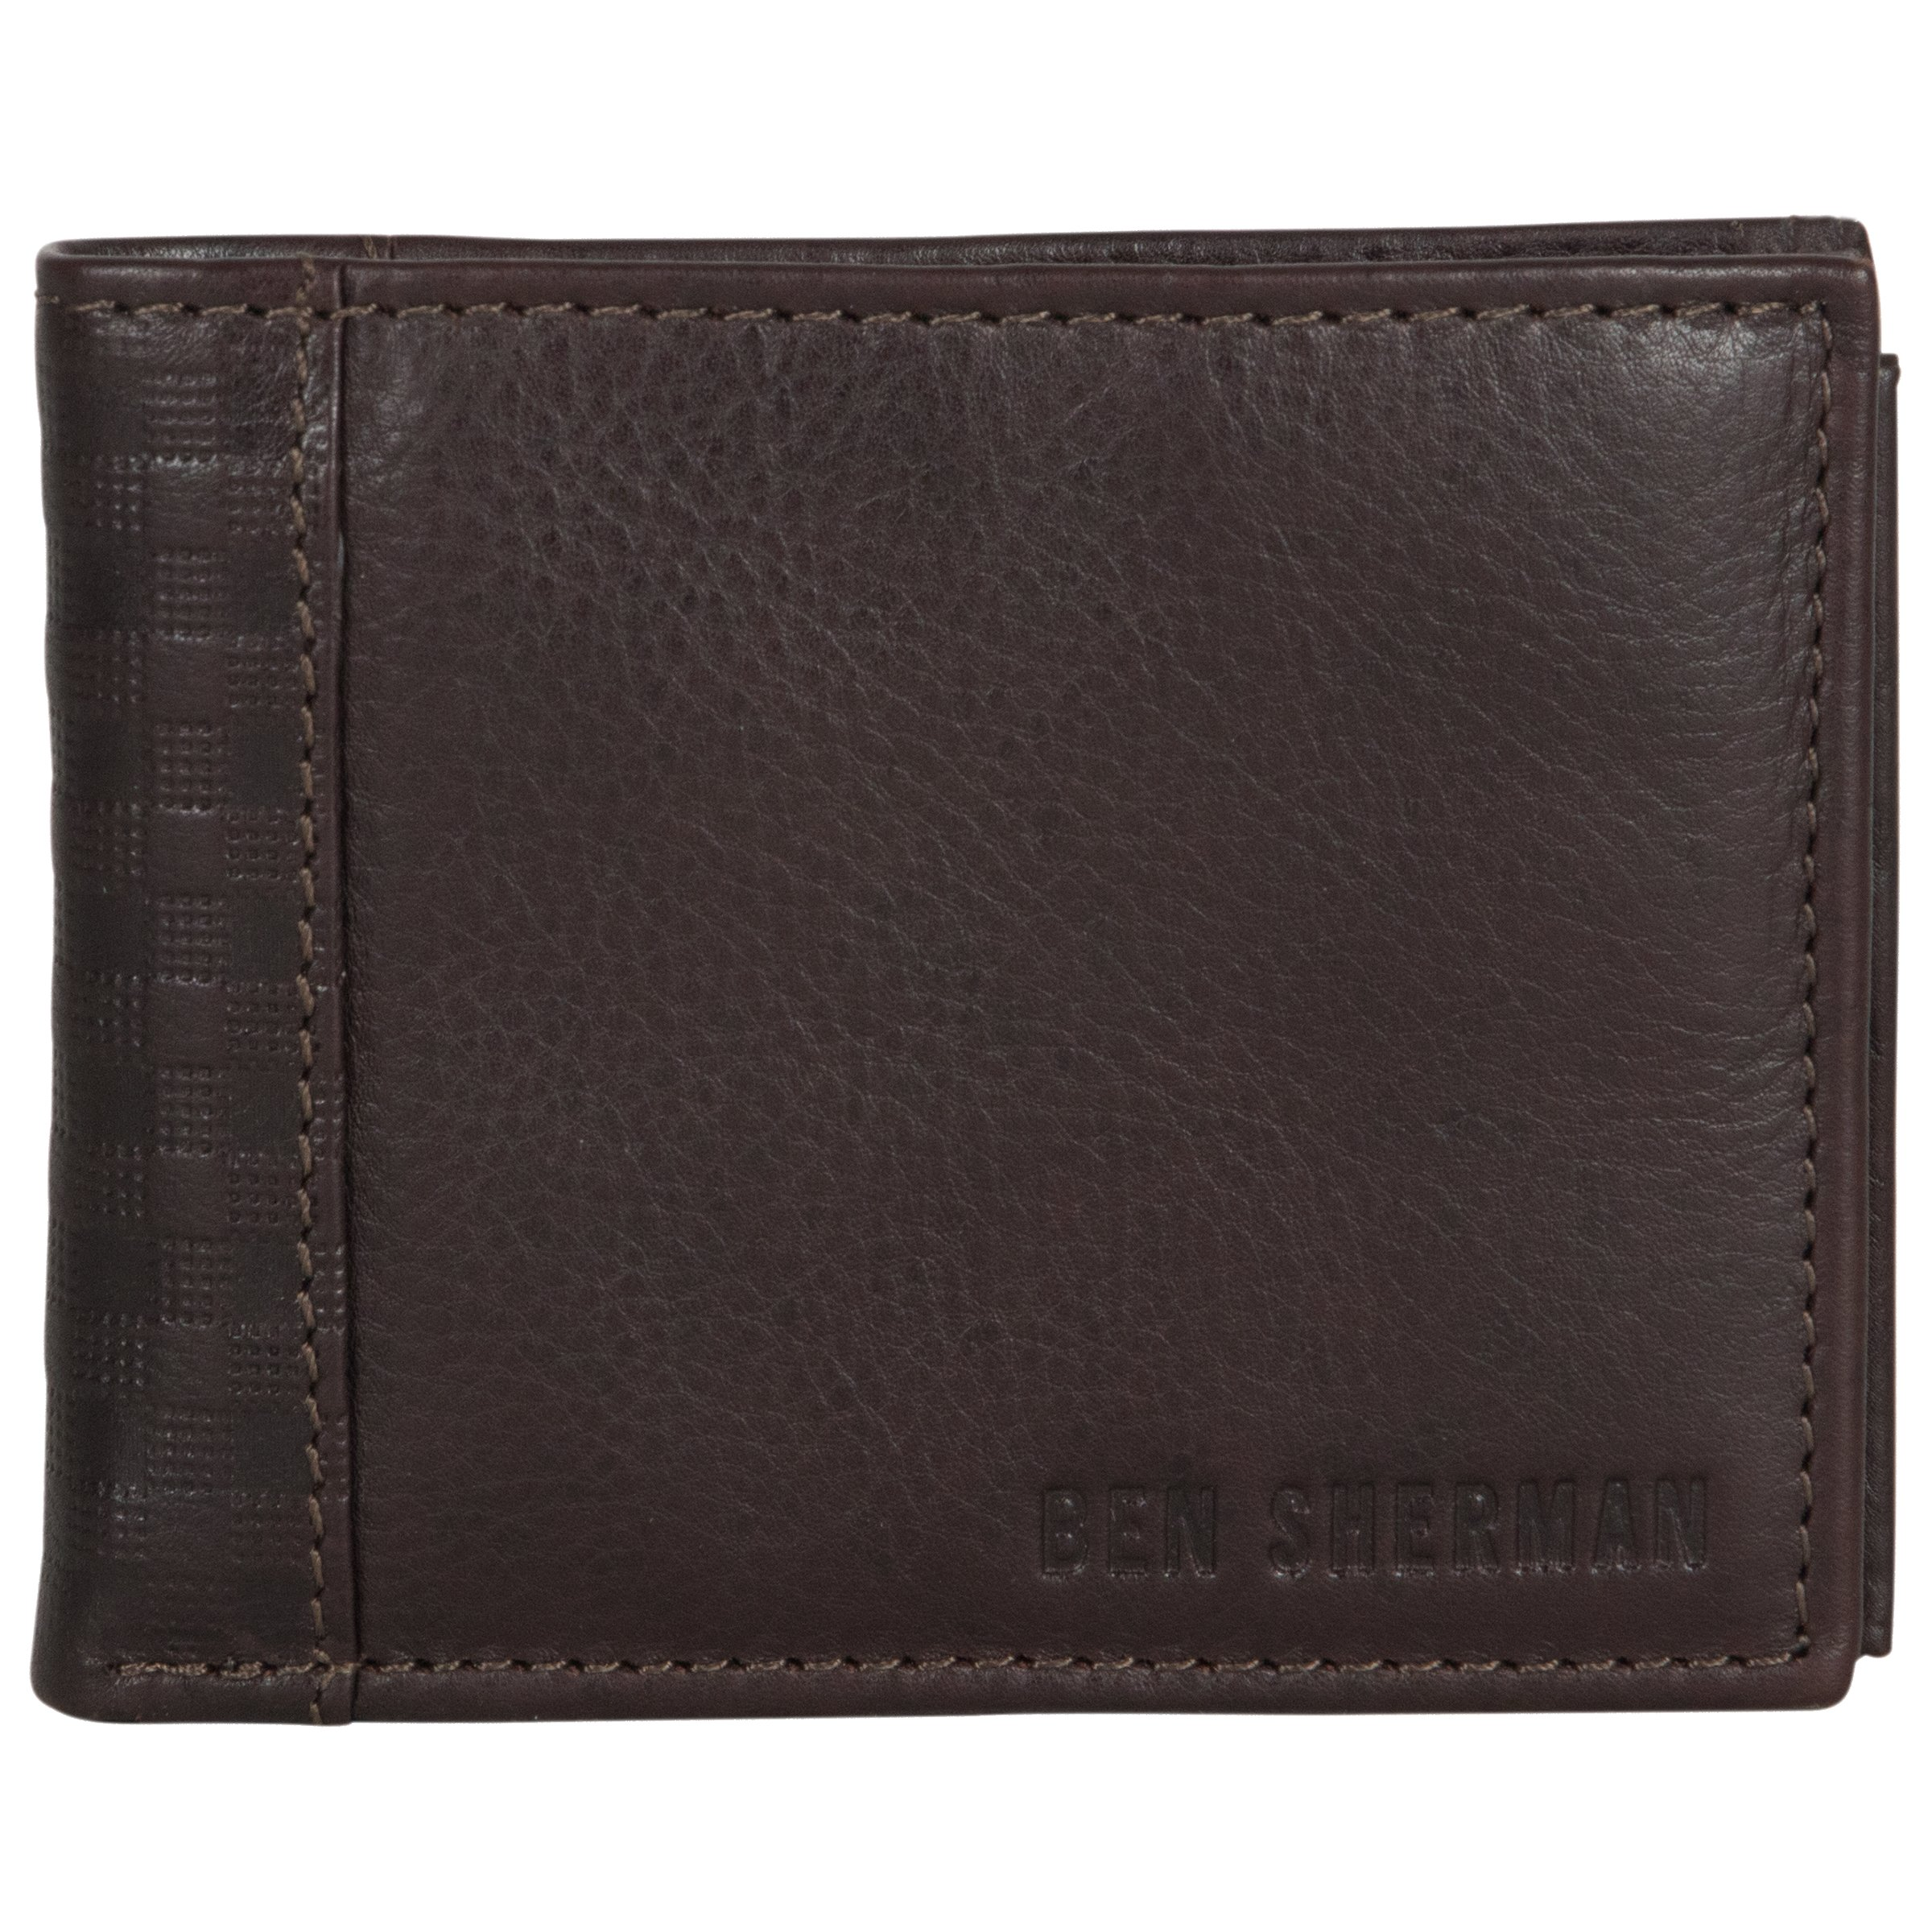 Ben Sherman Men's Leather Bi-Fold Passcase Nine Pocket Wallet with Id Window (Rfid), Brown